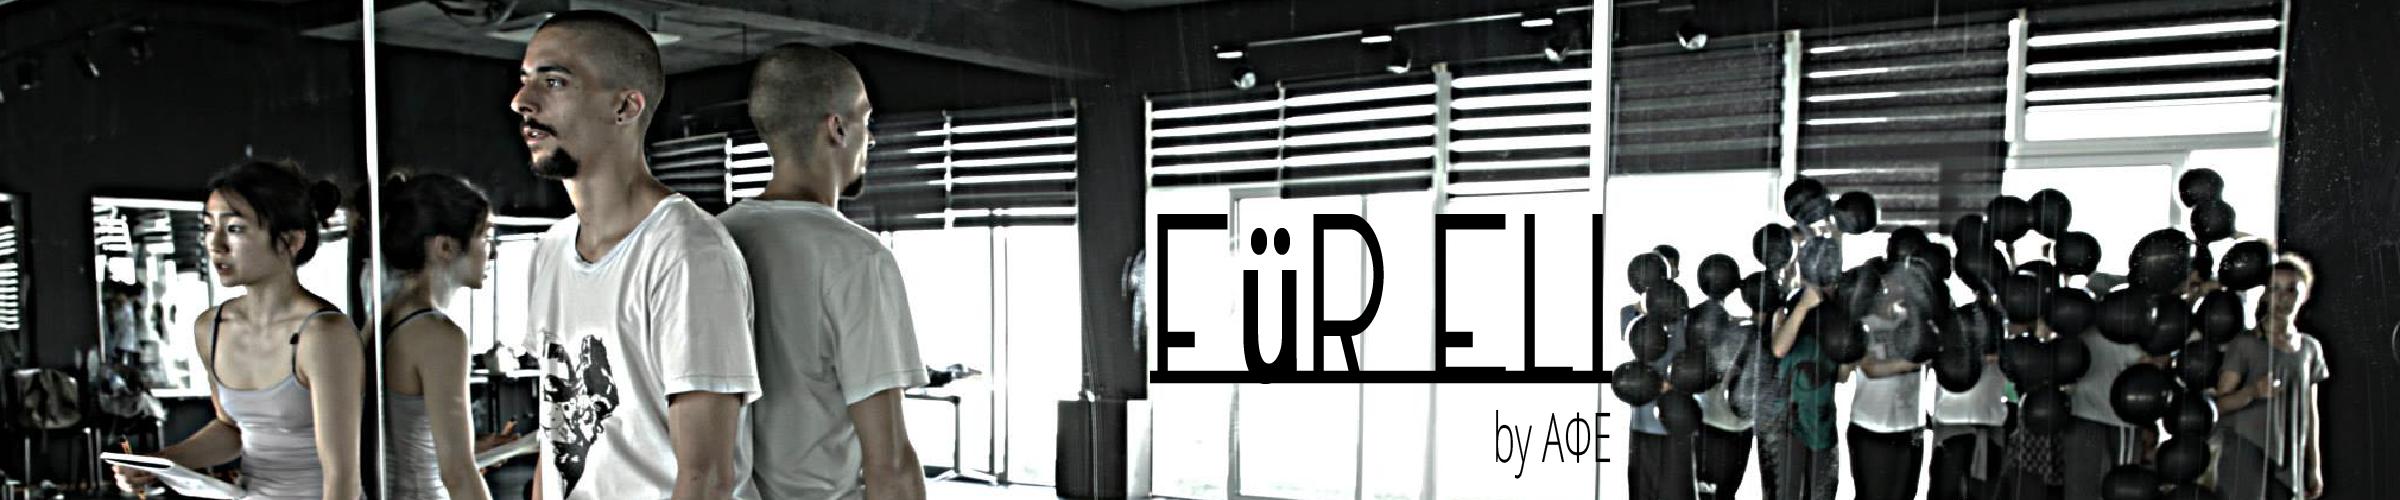 fuer eli banner-01.png